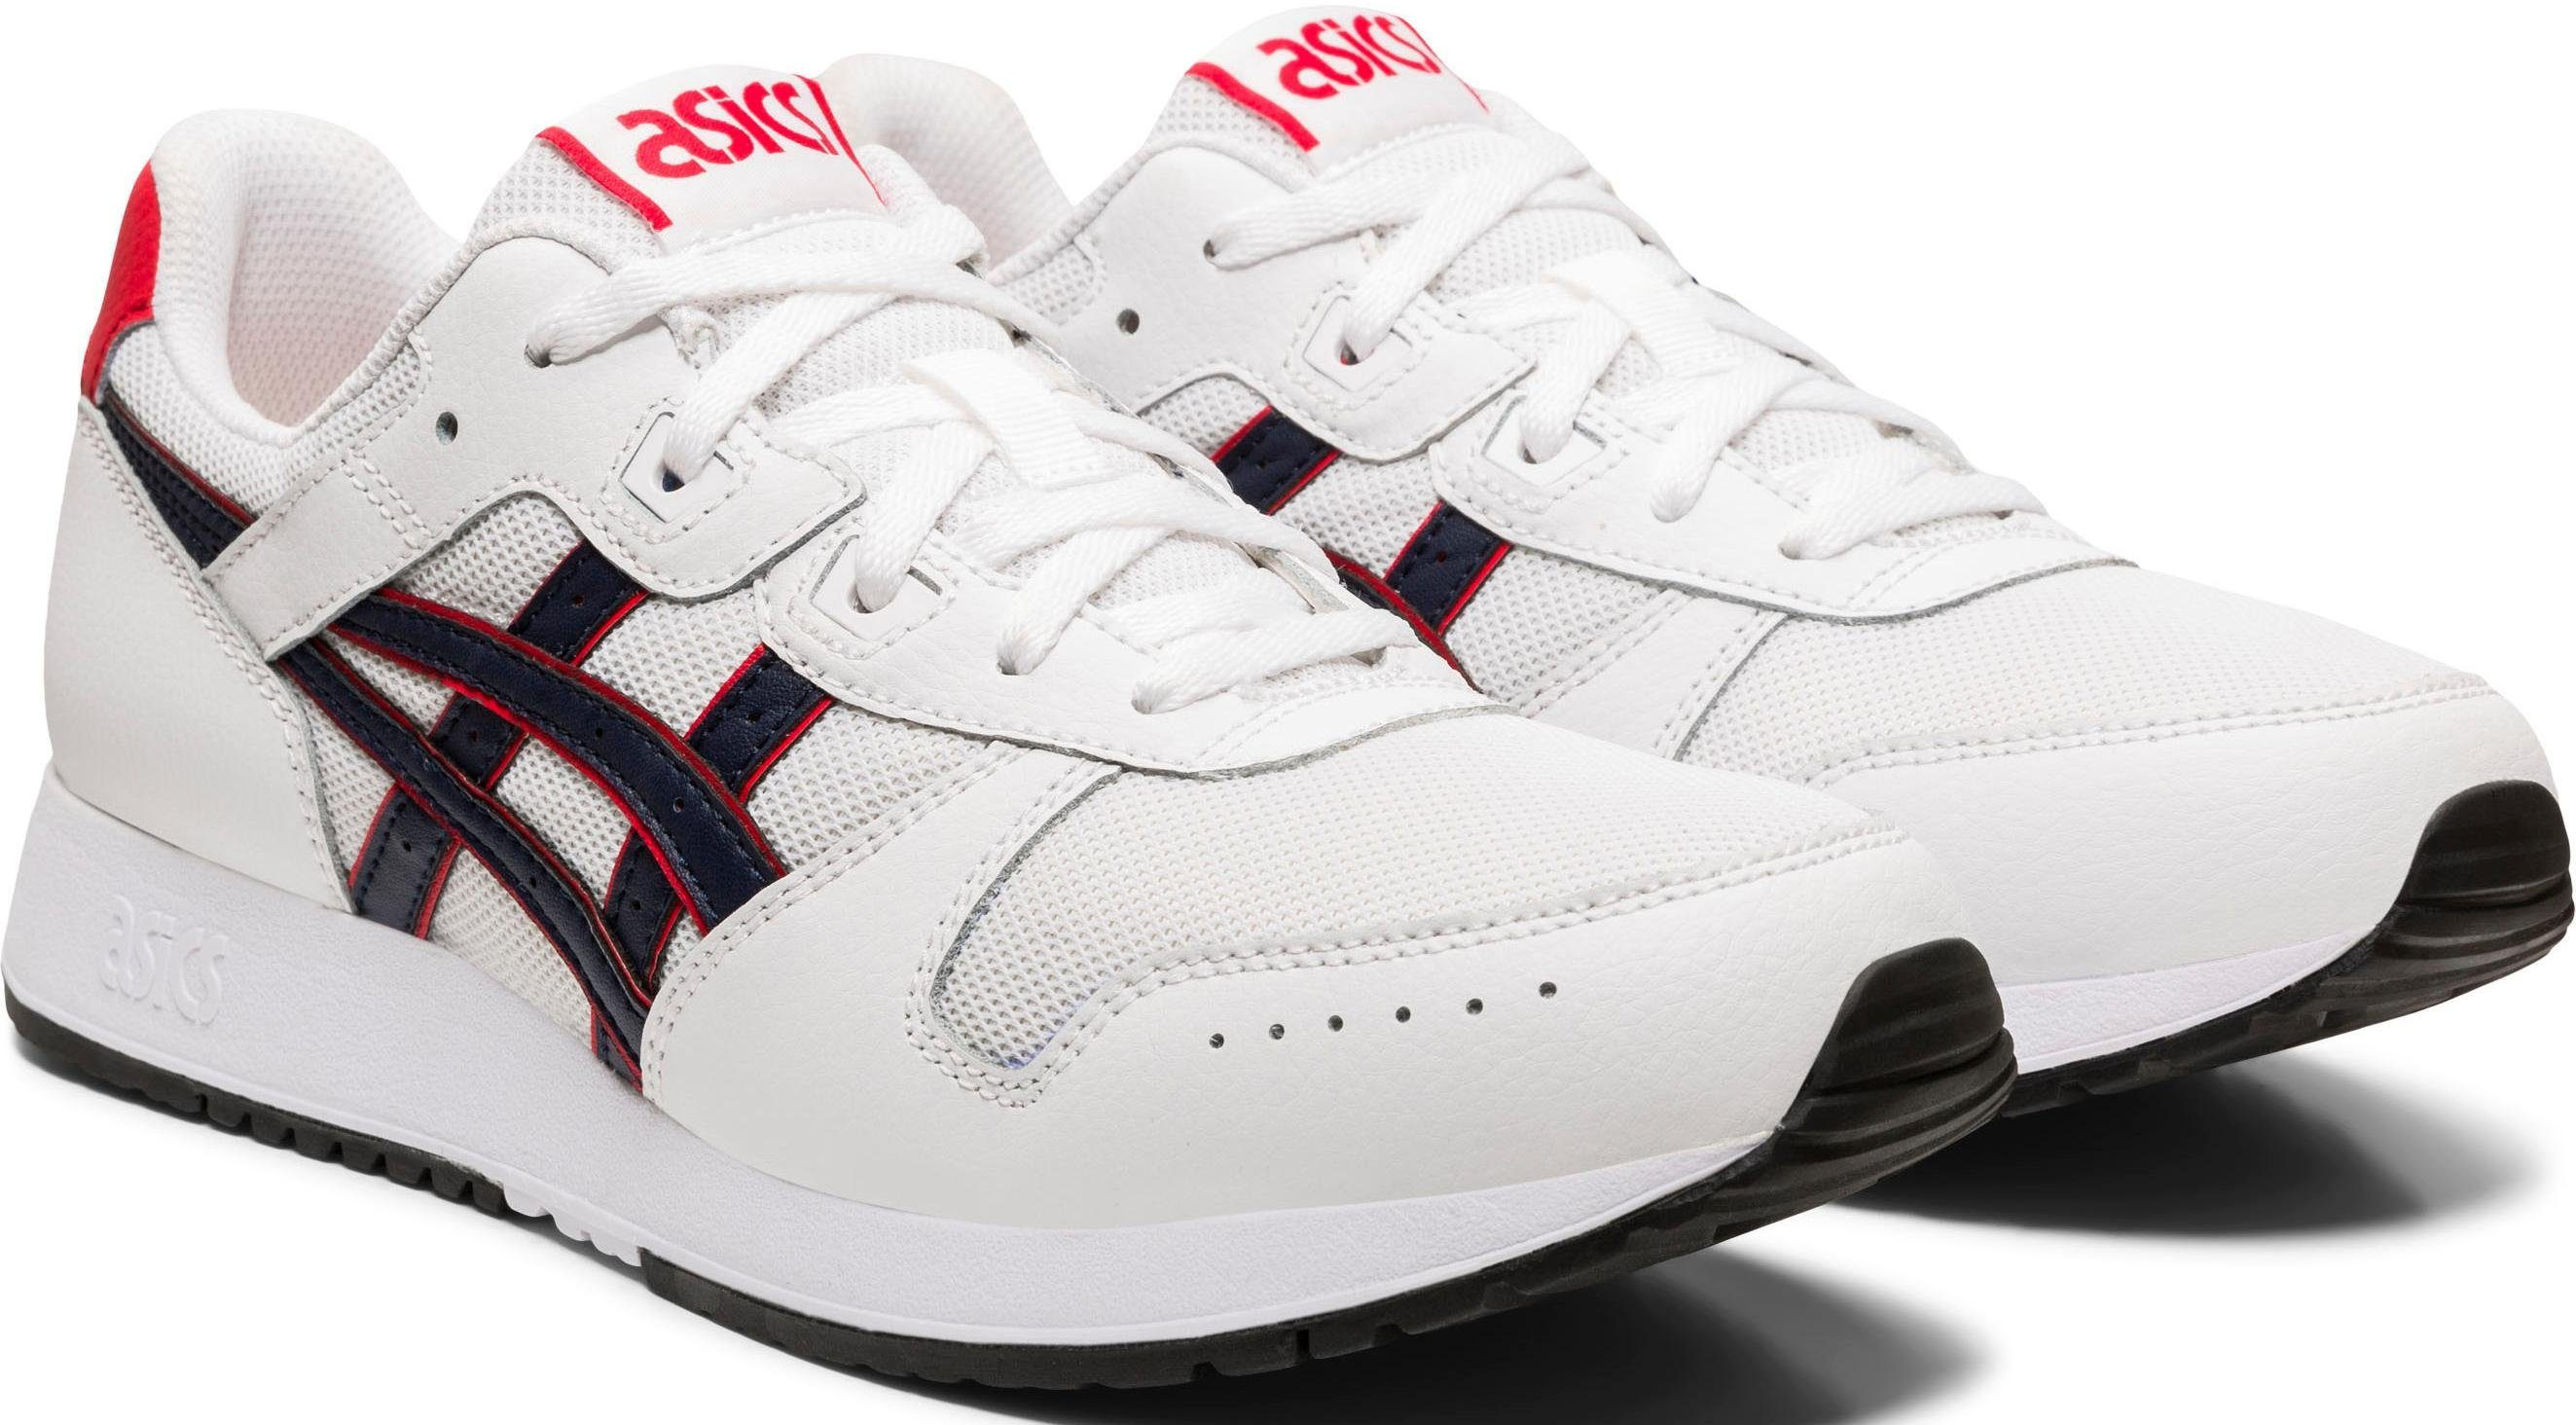 ASICS SportStyle »LYTE CLASSIC« Sneaker, Sportlicher Sneaker von Asics SportStyle online kaufen | OTTO